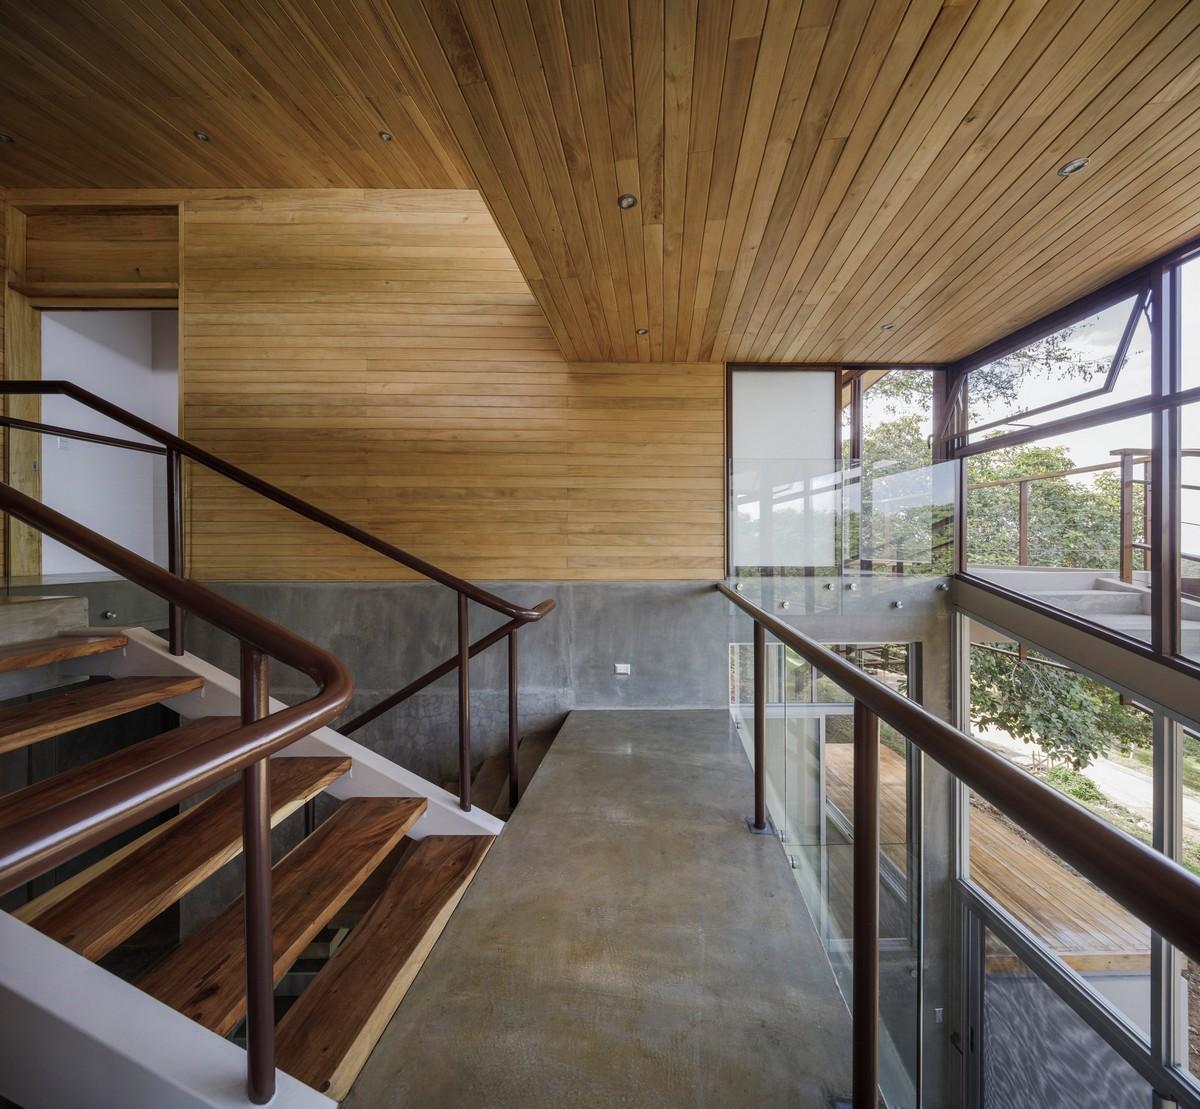 Casa de madeira e concreto no meio da mata